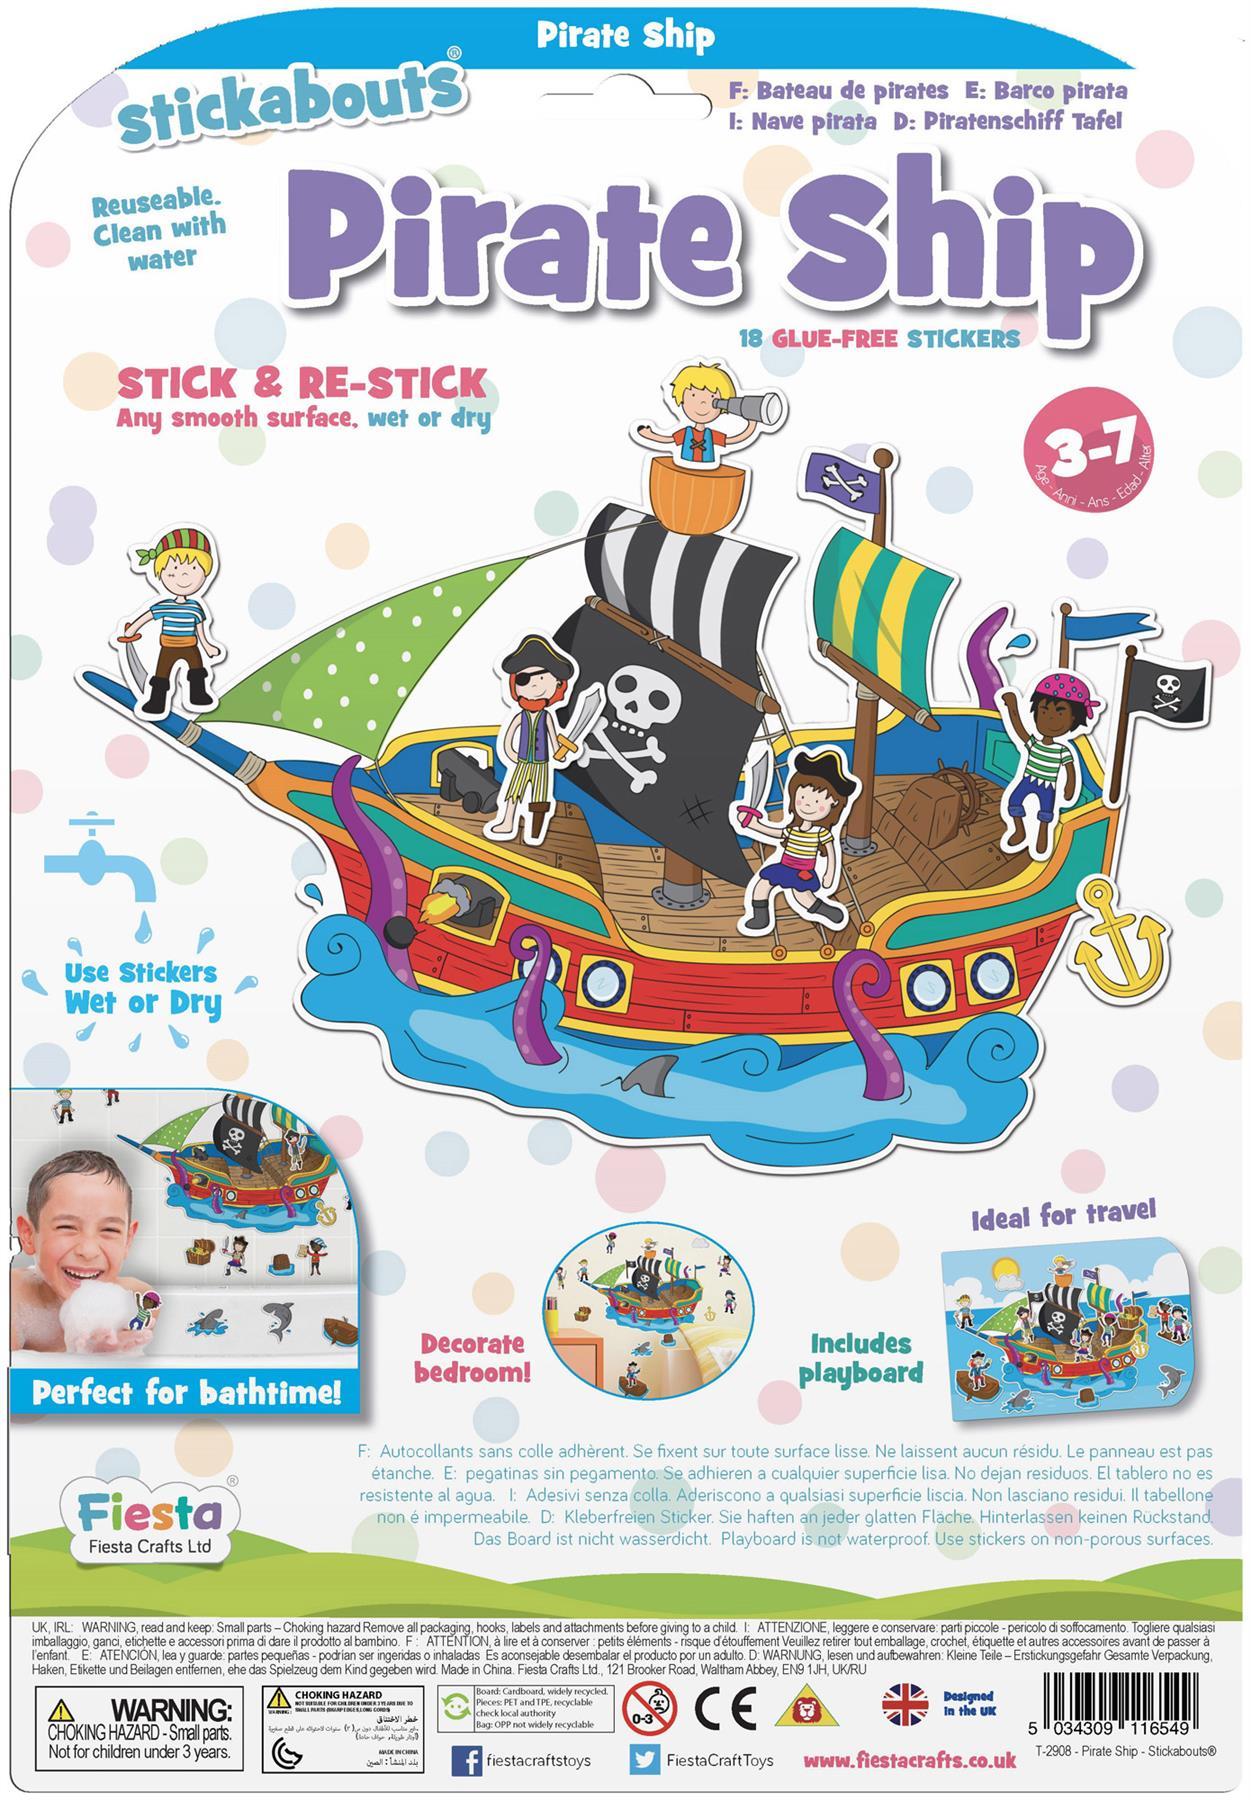 Fiesta Crafts STICKABOUTS AQUARIUM Reusable Sticker Toy BN